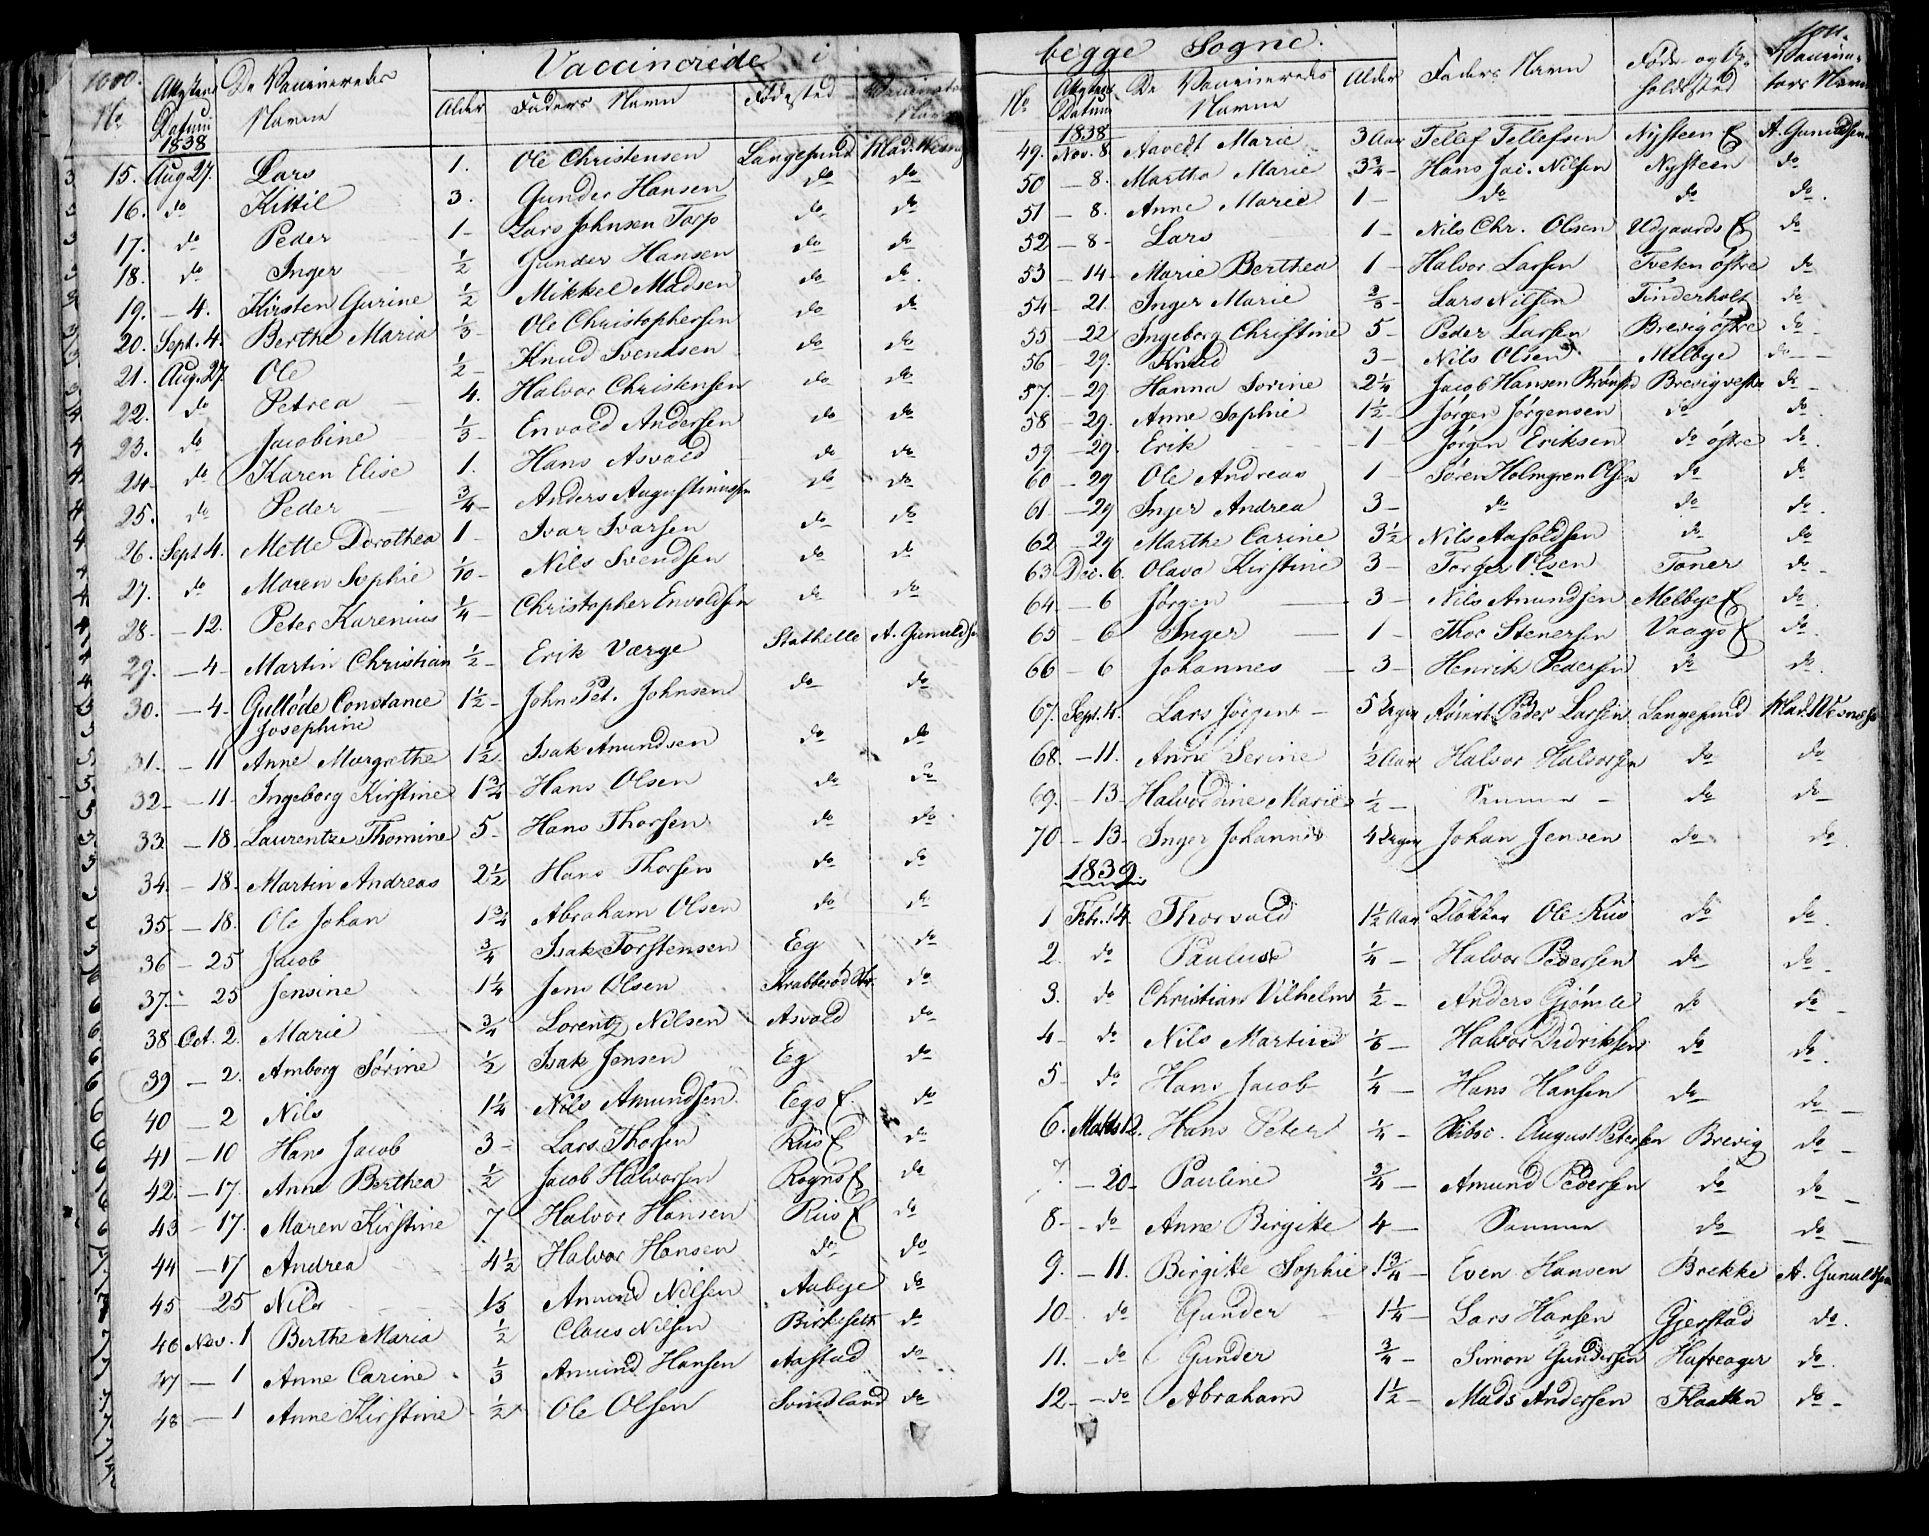 SAKO, Bamble kirkebøker, F/Fa/L0004: Ministerialbok nr. I 4, 1834-1853, s. 1010-1011